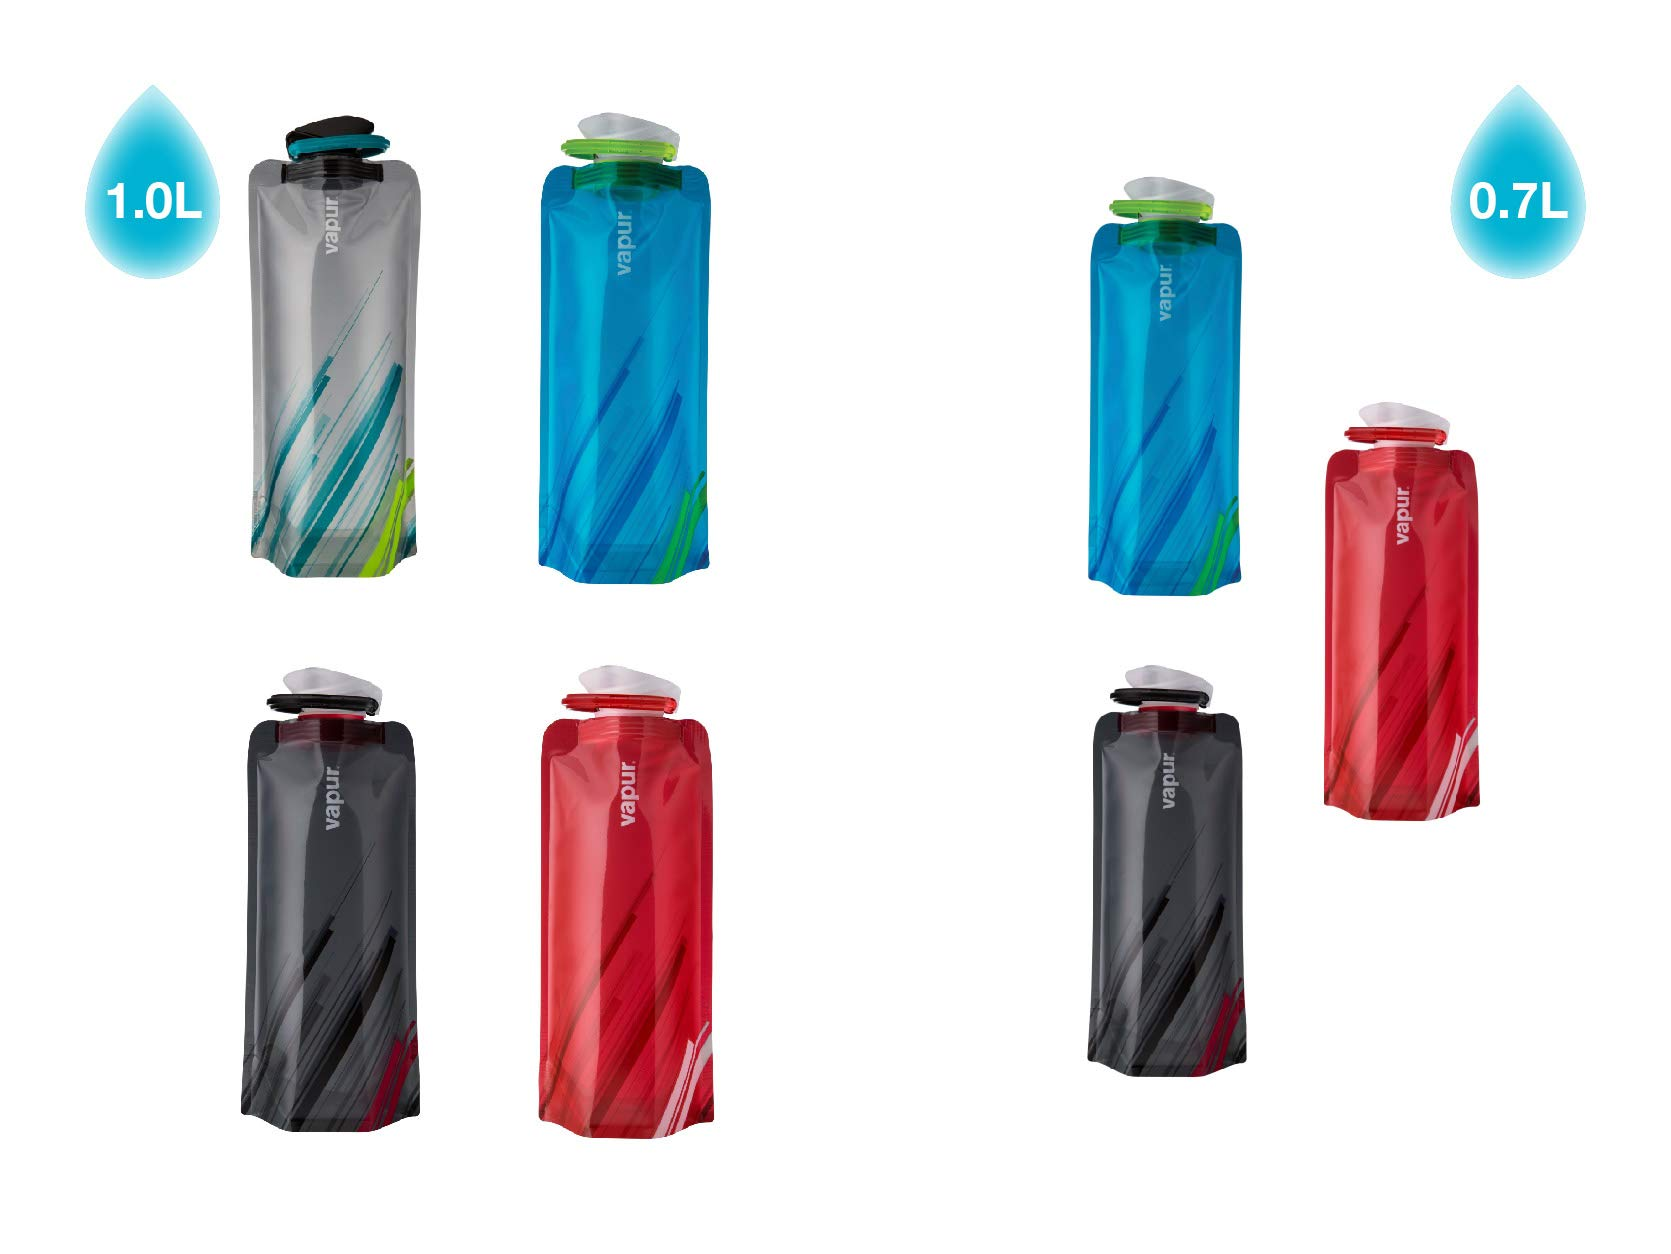 Vapur - Element 1.0L BPA Free Foldable Flexible Water Bottle w/Carabiner (Grey/Teal) by Vapur (Image #8)